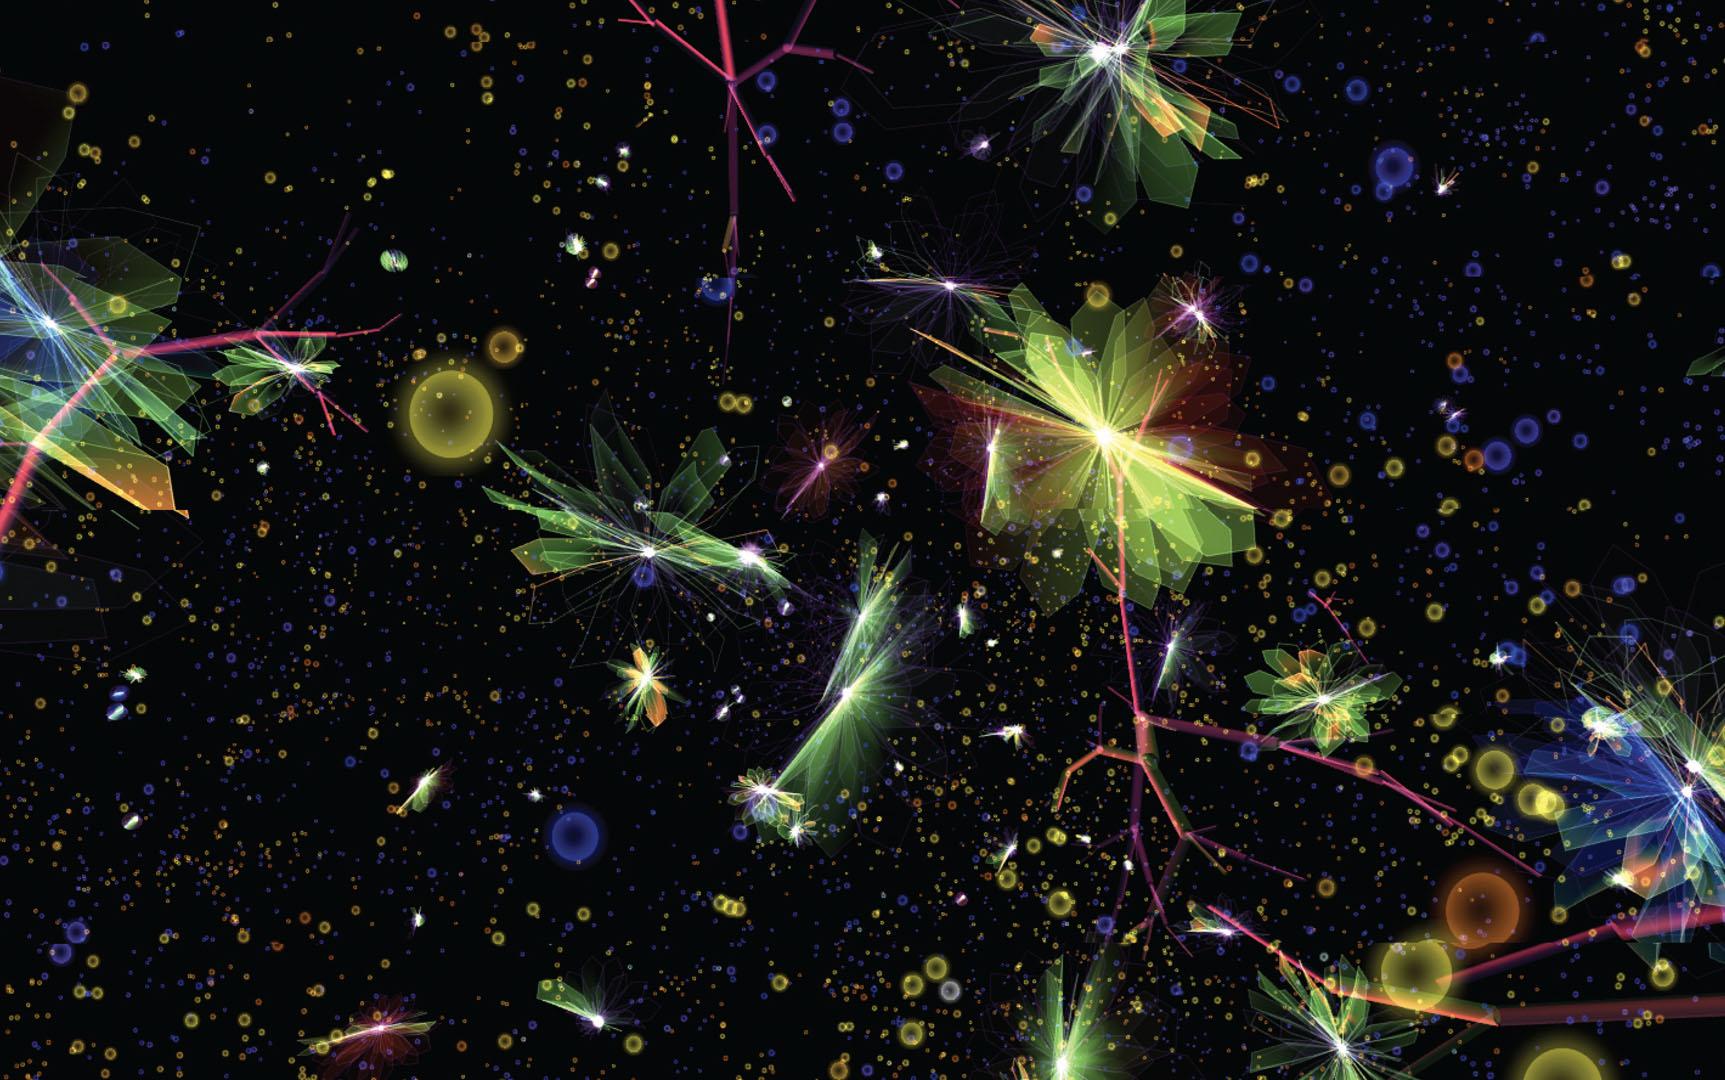 ©, Haru (Hyunkyung) Ji and Graham Wakefield, Artificial Nature: Fluid Space